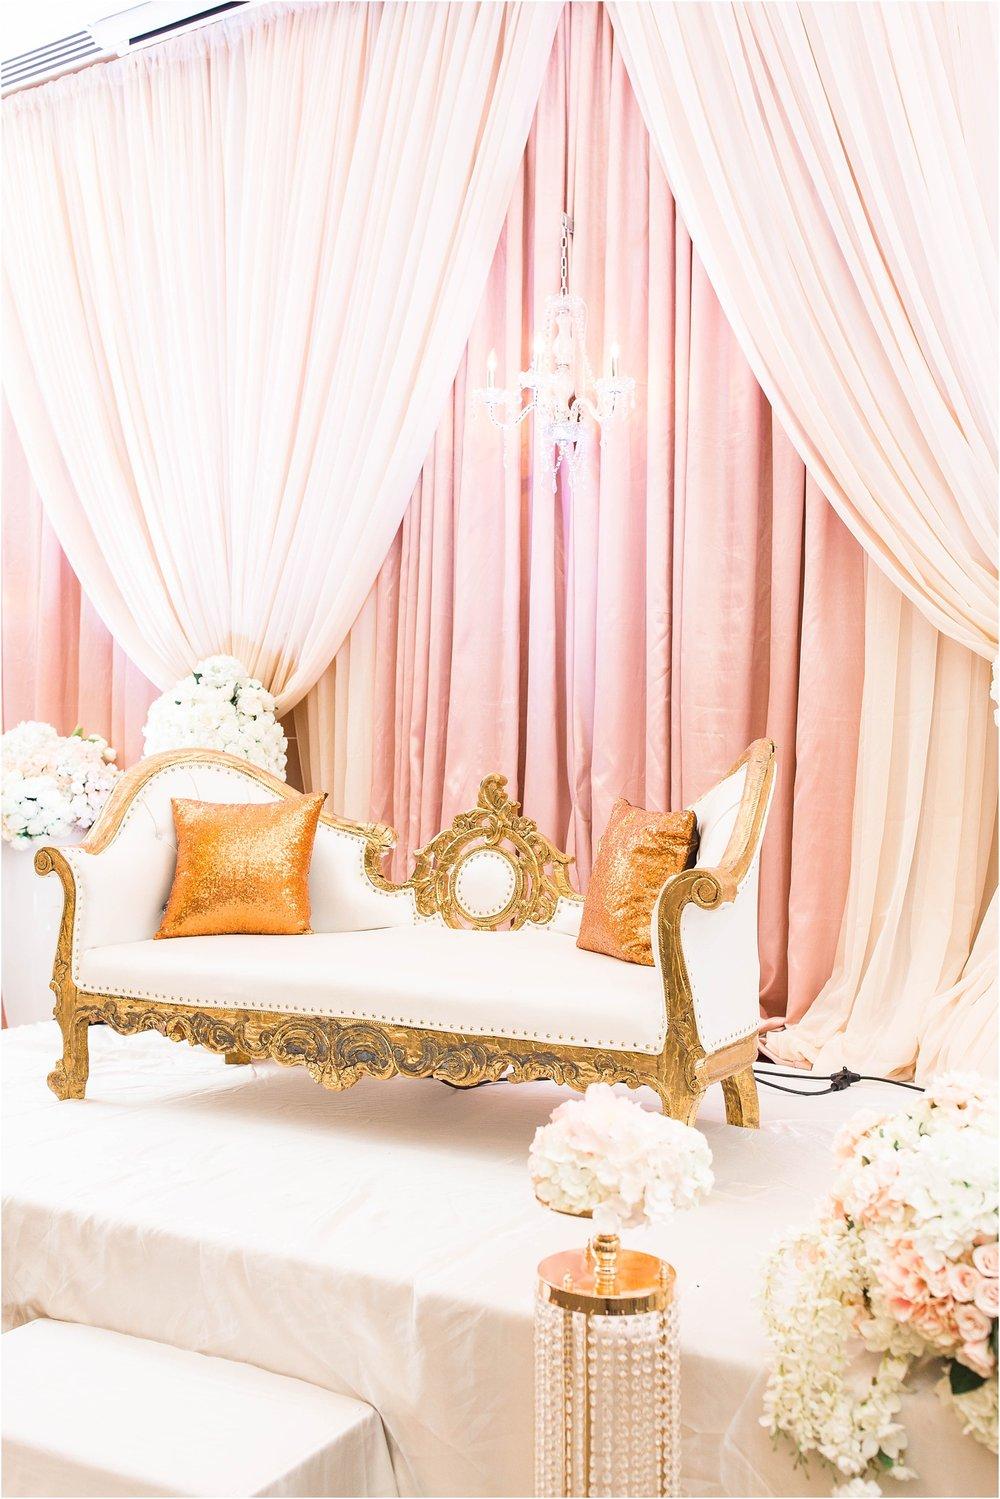 Red-Rose-Convention-Mint-Room-Wedding-Toronto-Mississauga-Brampton-Scarborough-GTA-Pakistani-Indian-Wedding-Engagement-Photographer-Photography_0119.jpg